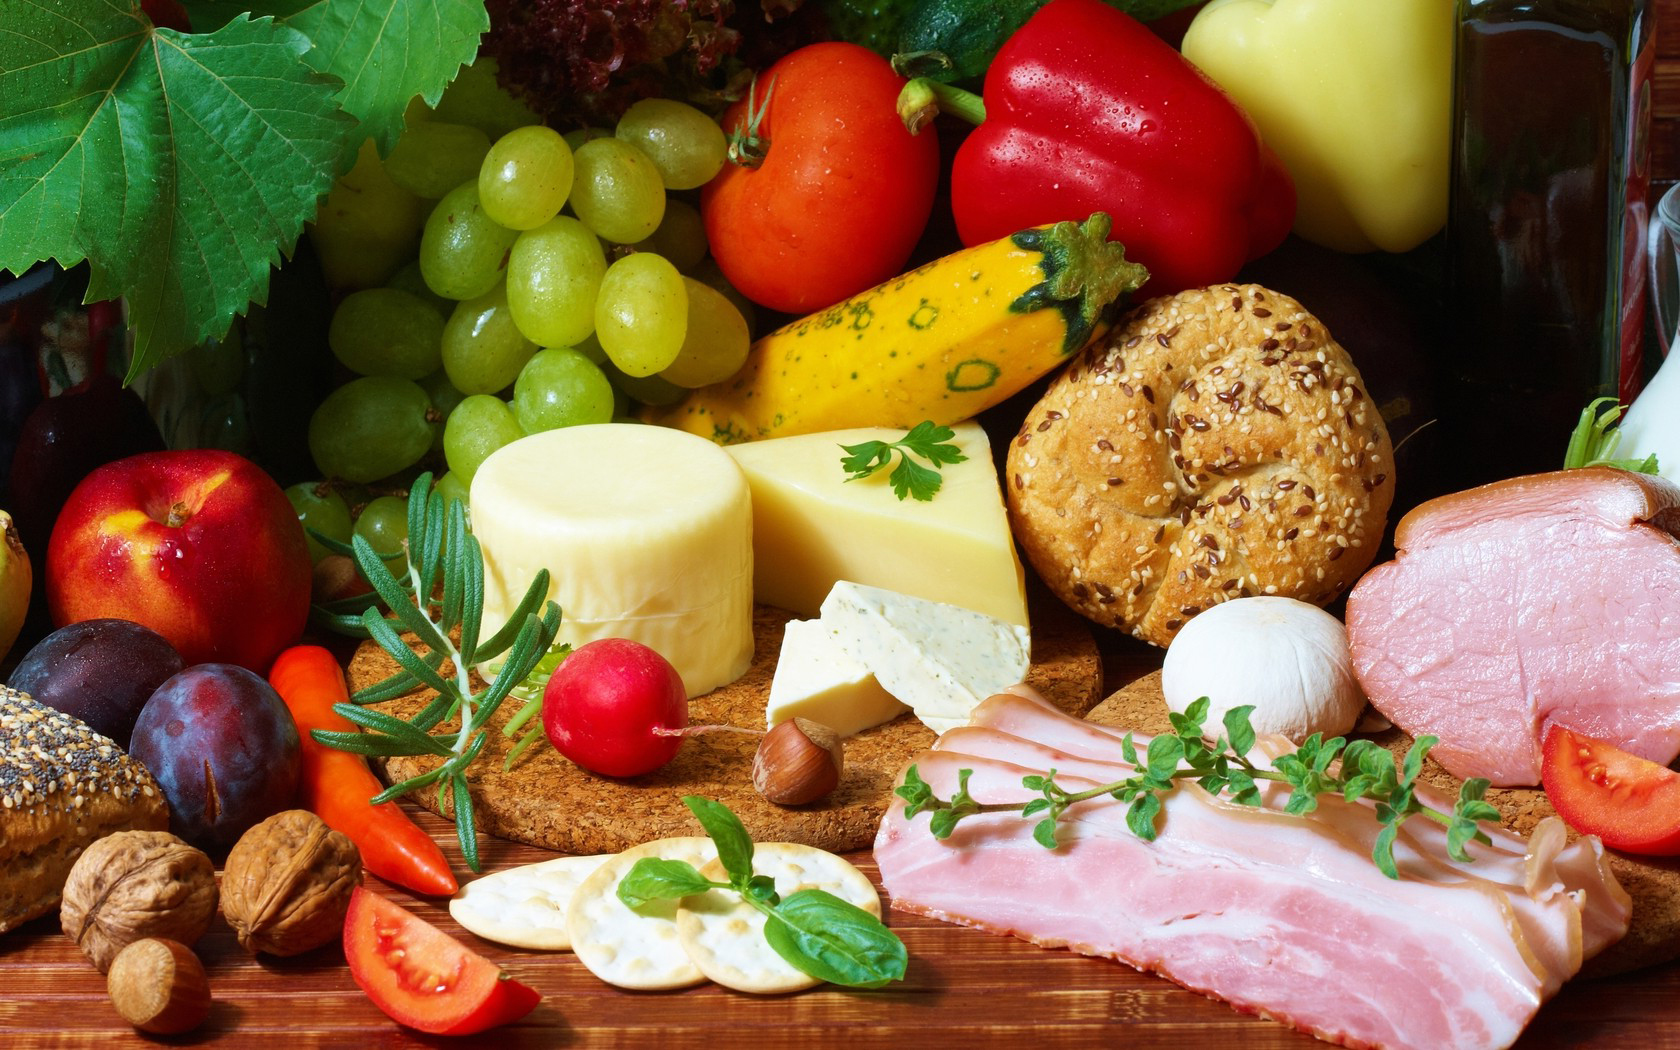 food desktop wallpaper 1680x1050